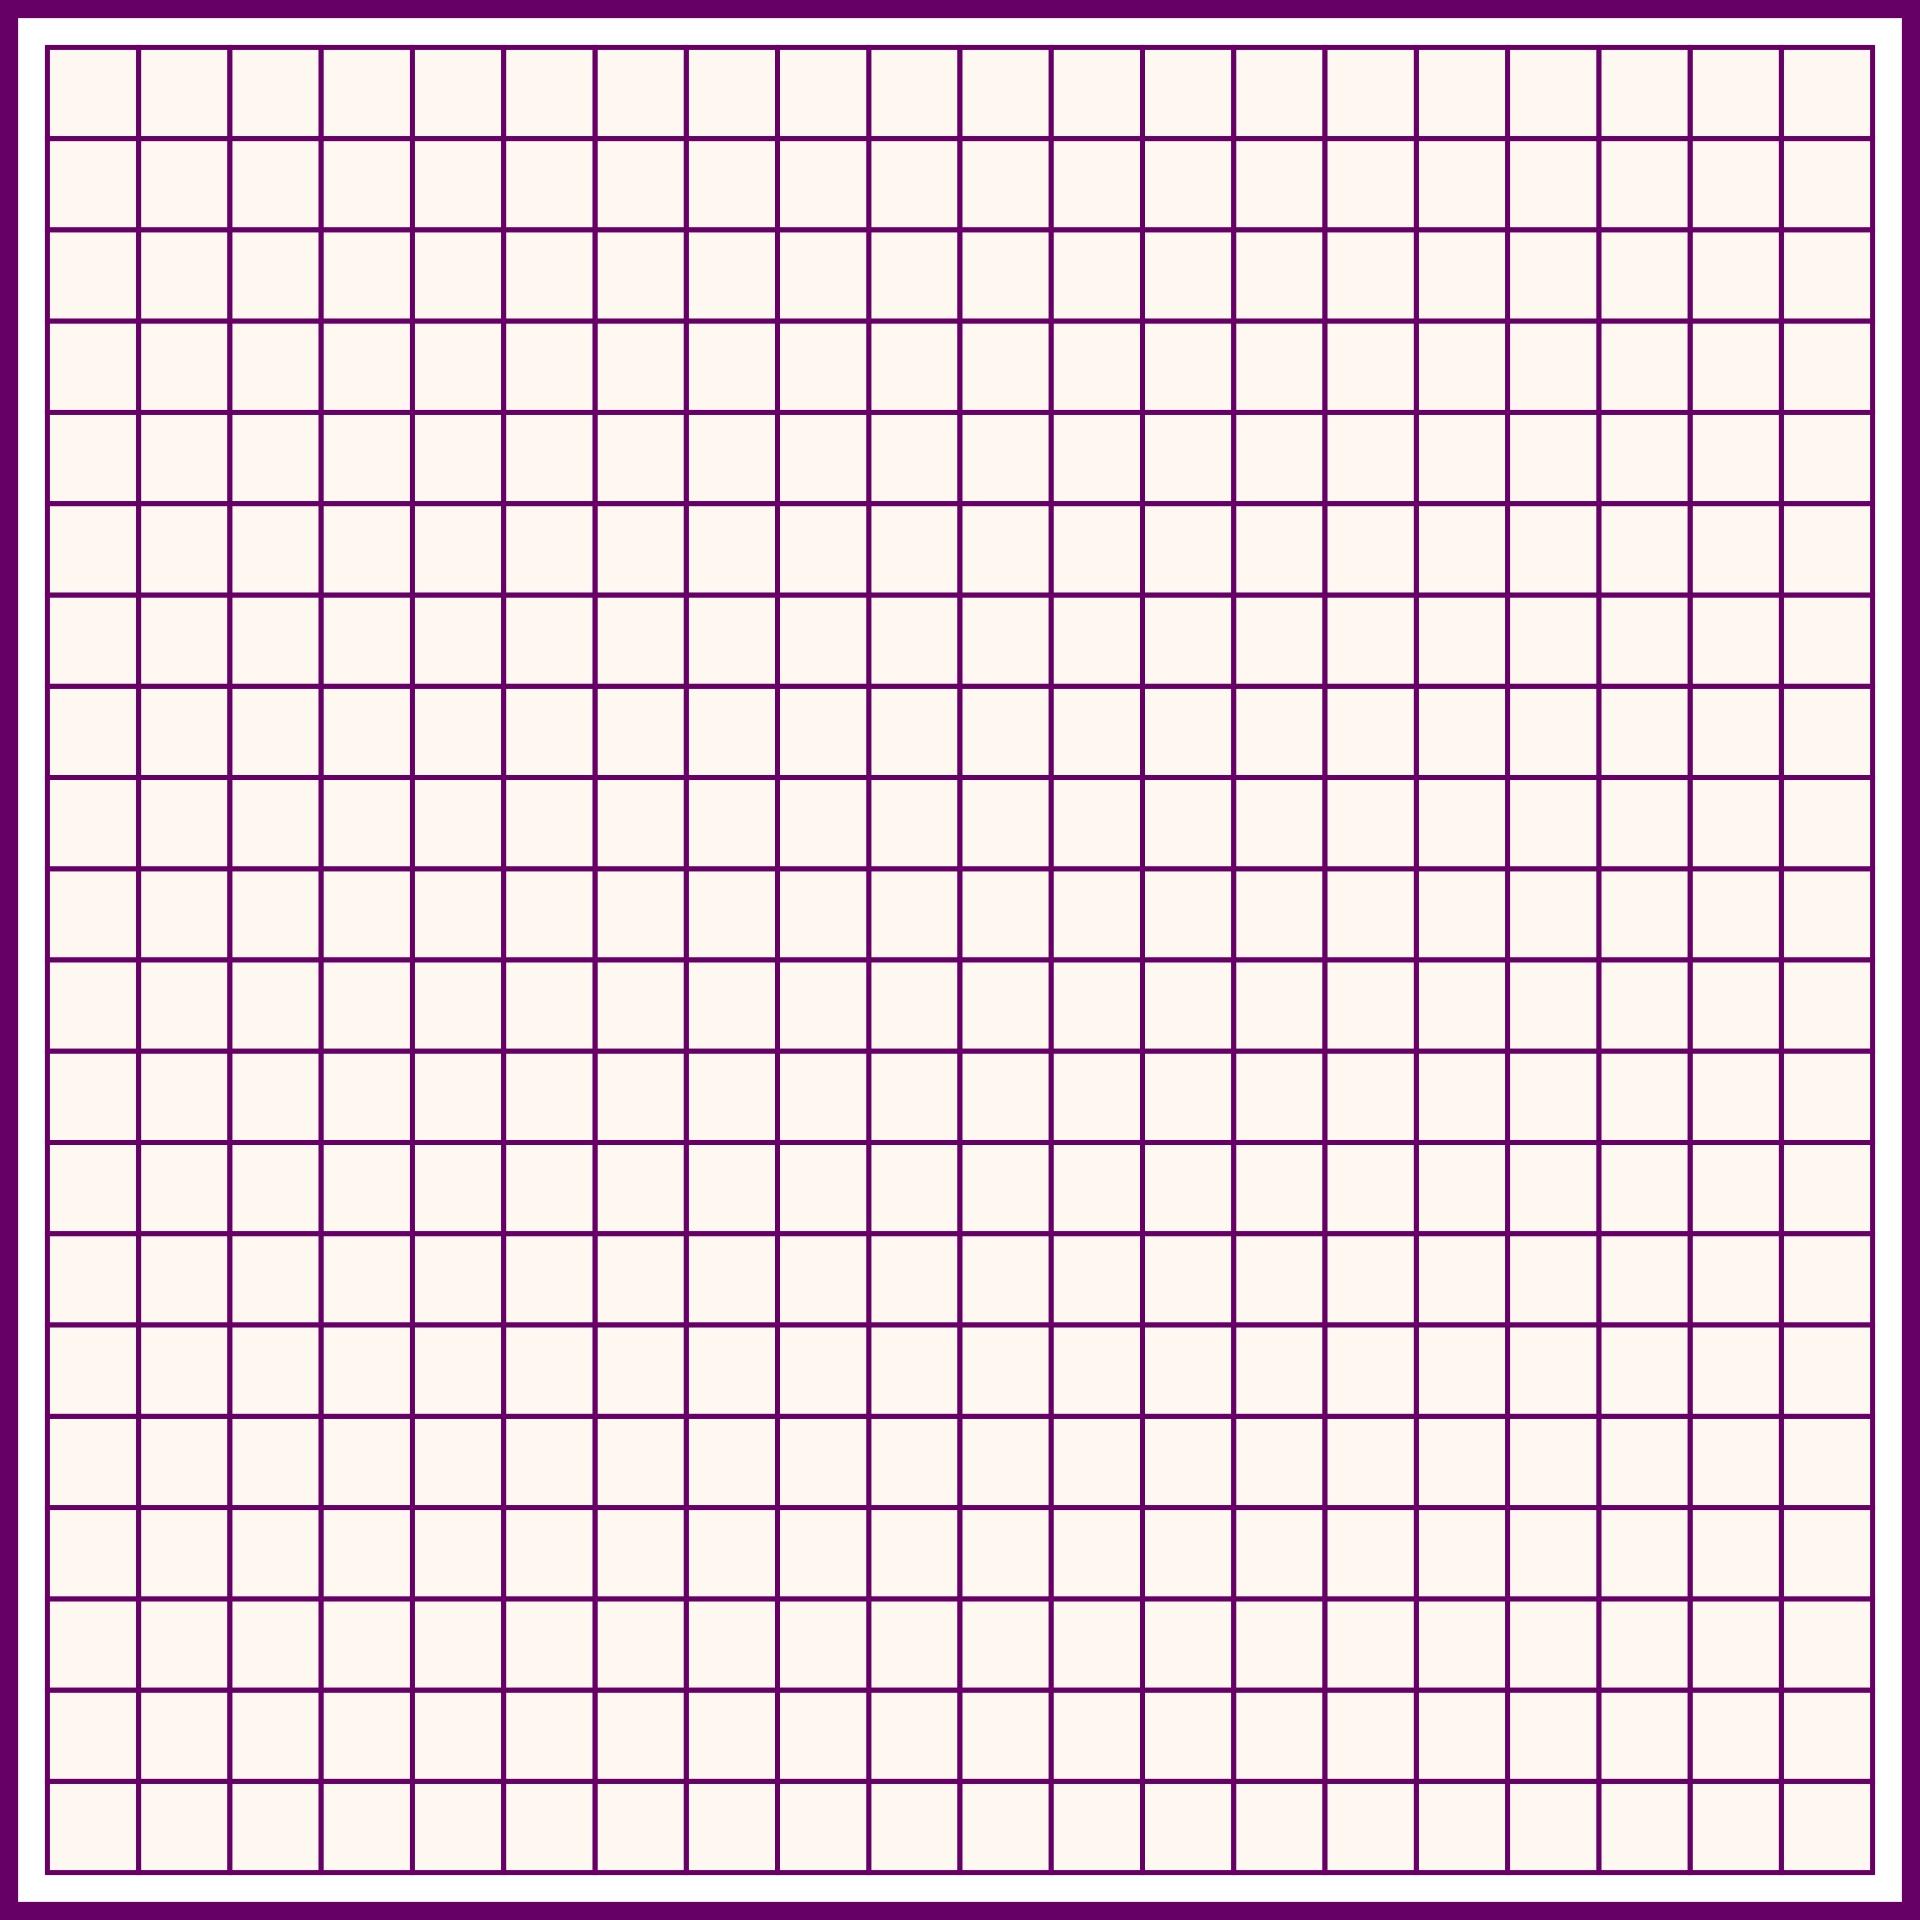 Best Images of 20 X 20 Grid Printable - Printable Grid Graph Paper ...